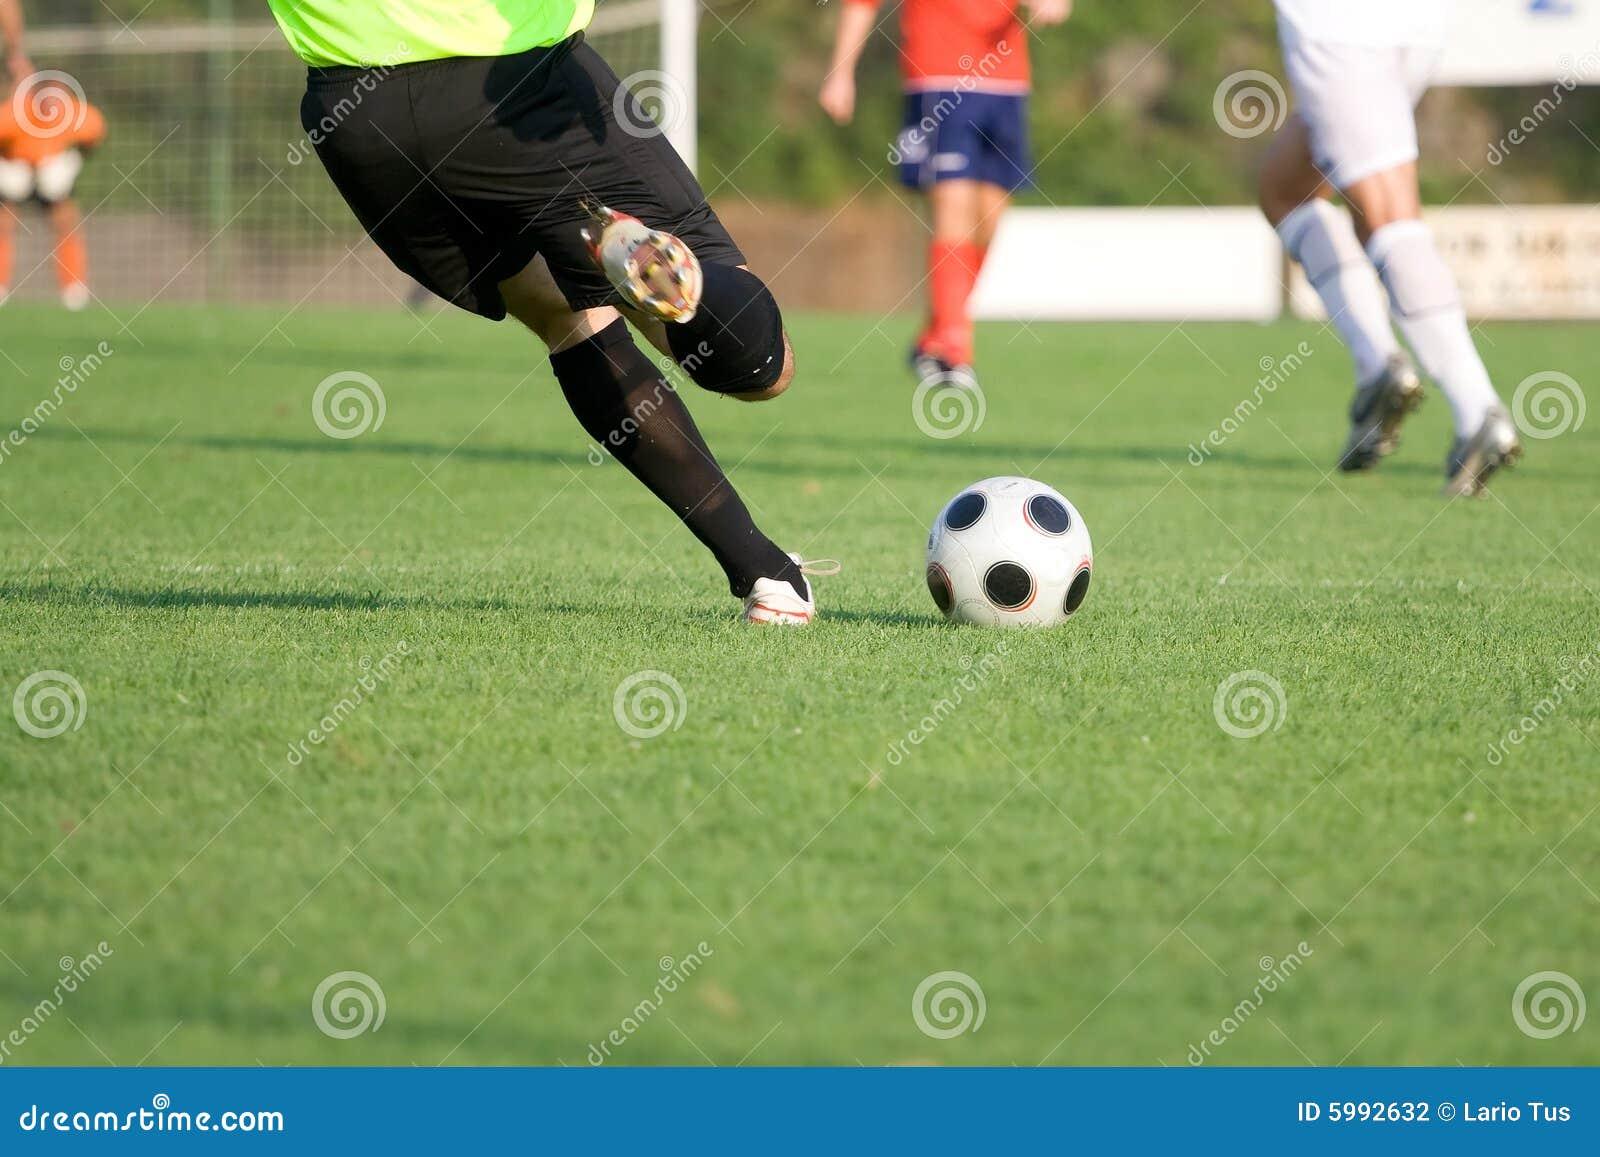 soccer  football  action shot stock photography